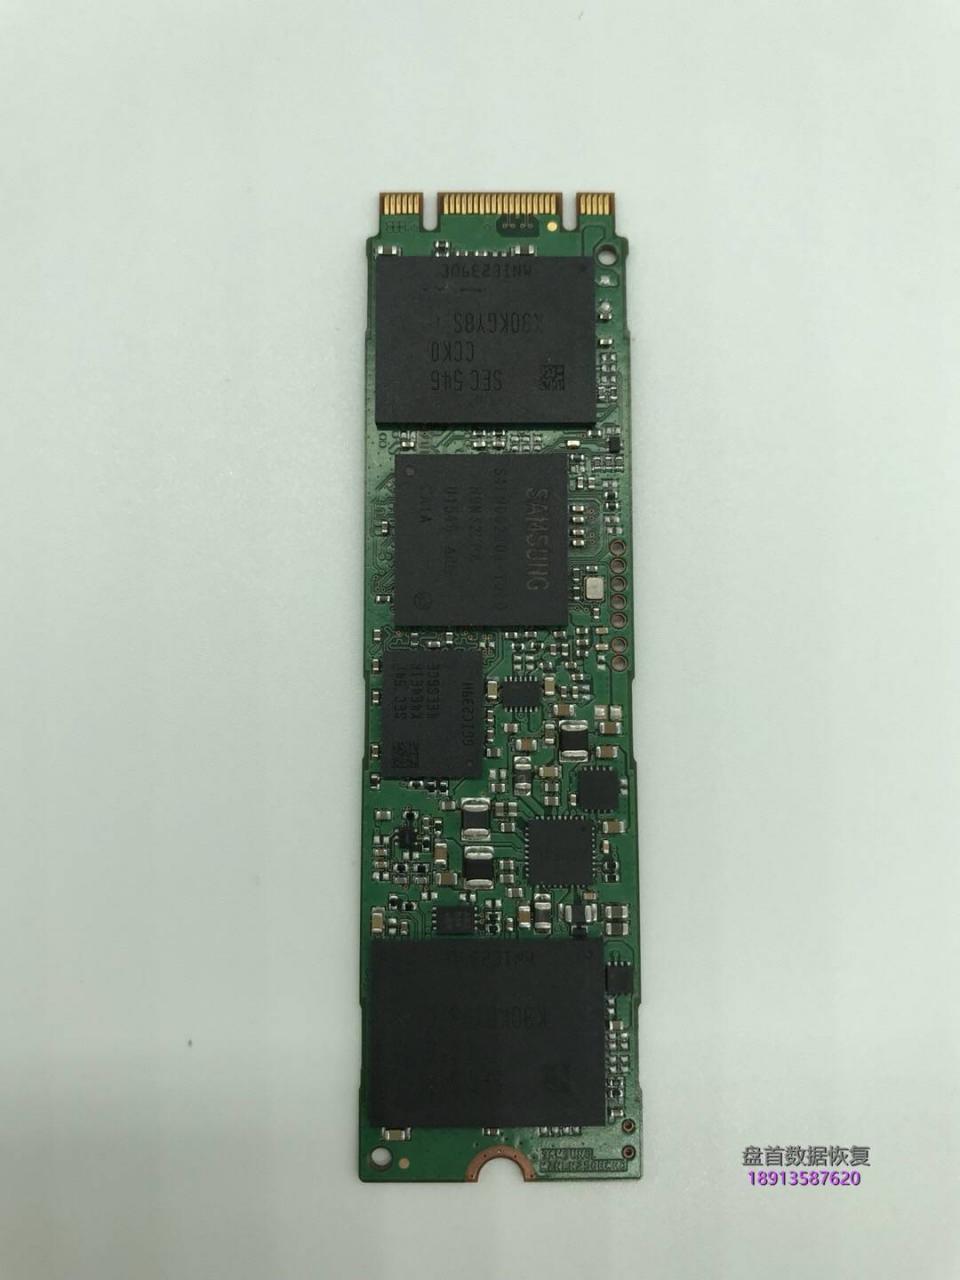 Samsung三星SSD M.2 128GB PM871 MZNLN128HCGR掉盘无法识别不读盘数据恢复成功